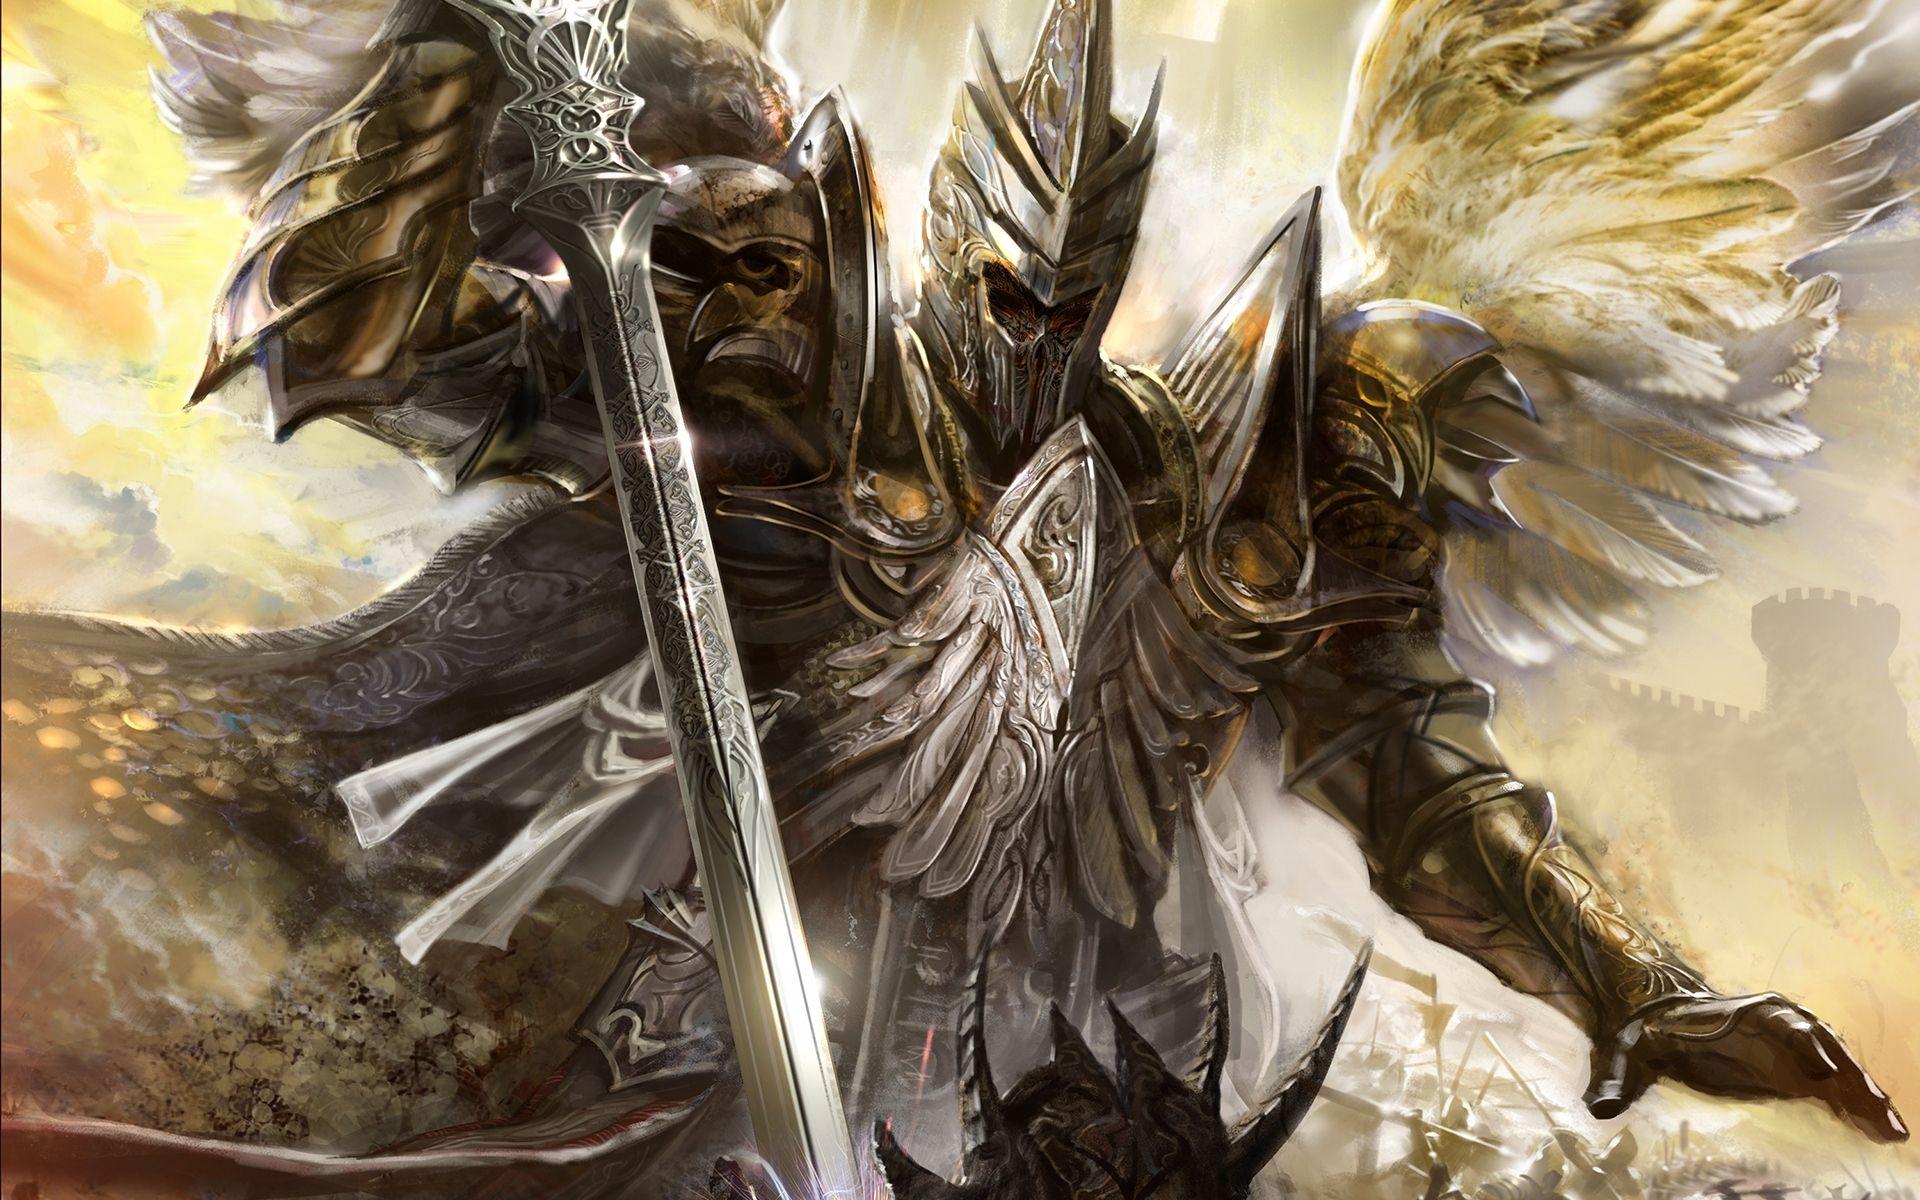 Warrior Fantasy Art Armor Angel Magic Wallpapers Hd: Fantasy, Horrmor, Art, Feather, Angel, Wings, Sword, Kick